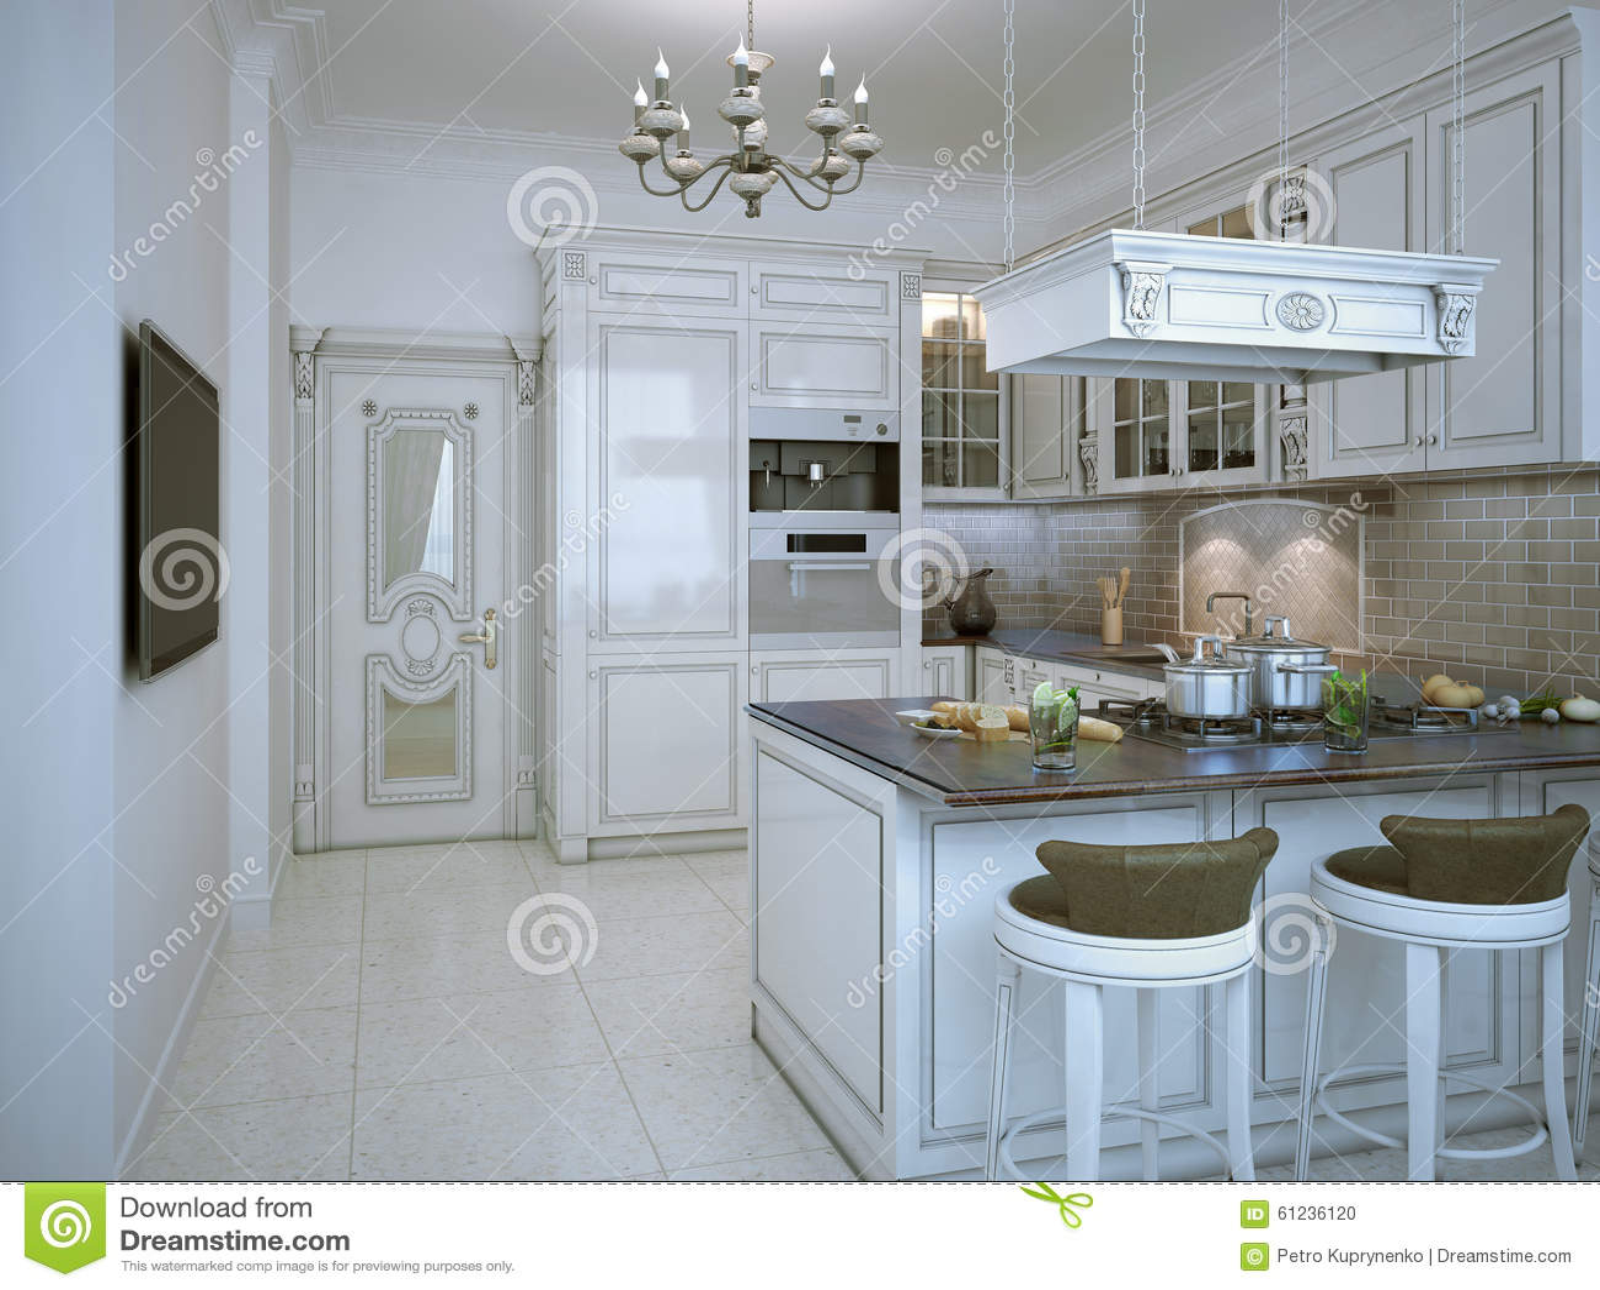 kitchen art decor aide juicer 光滑的厨房艺术装饰样式库存例证 插画包括有豪华 机柜 艺术 经典 与酒吧和电视的光滑的厨房艺术装饰样式白色内部 优美的瓦片地板3d回报